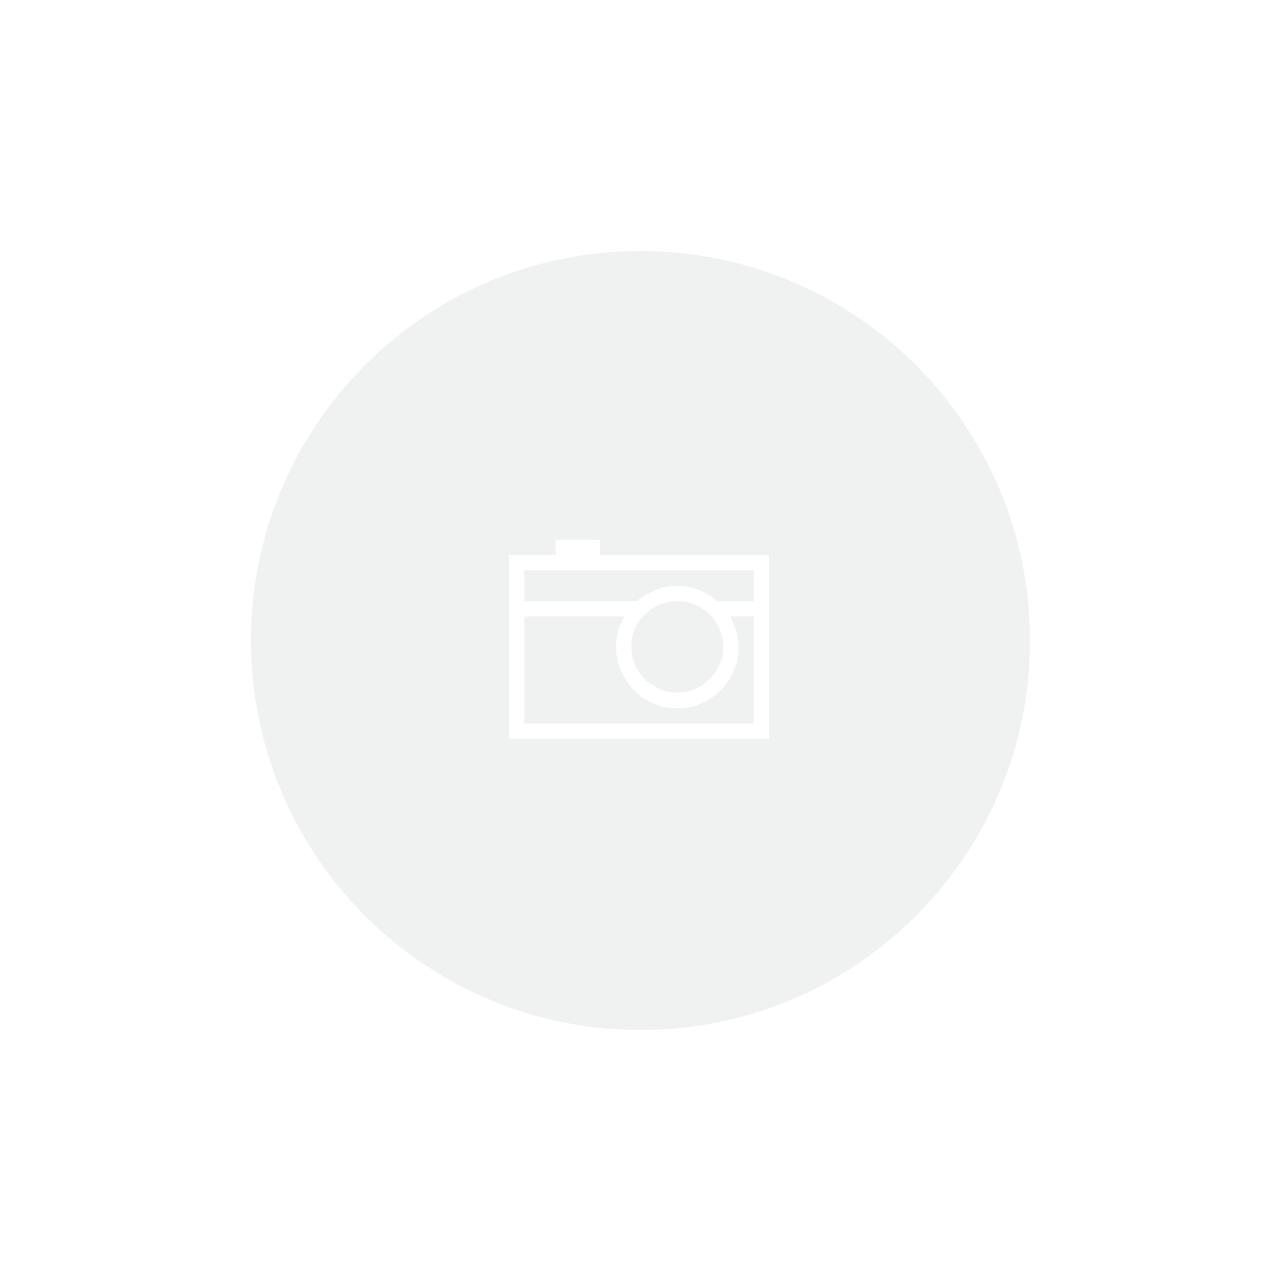 vestido-tingido-pcruz-014vf16